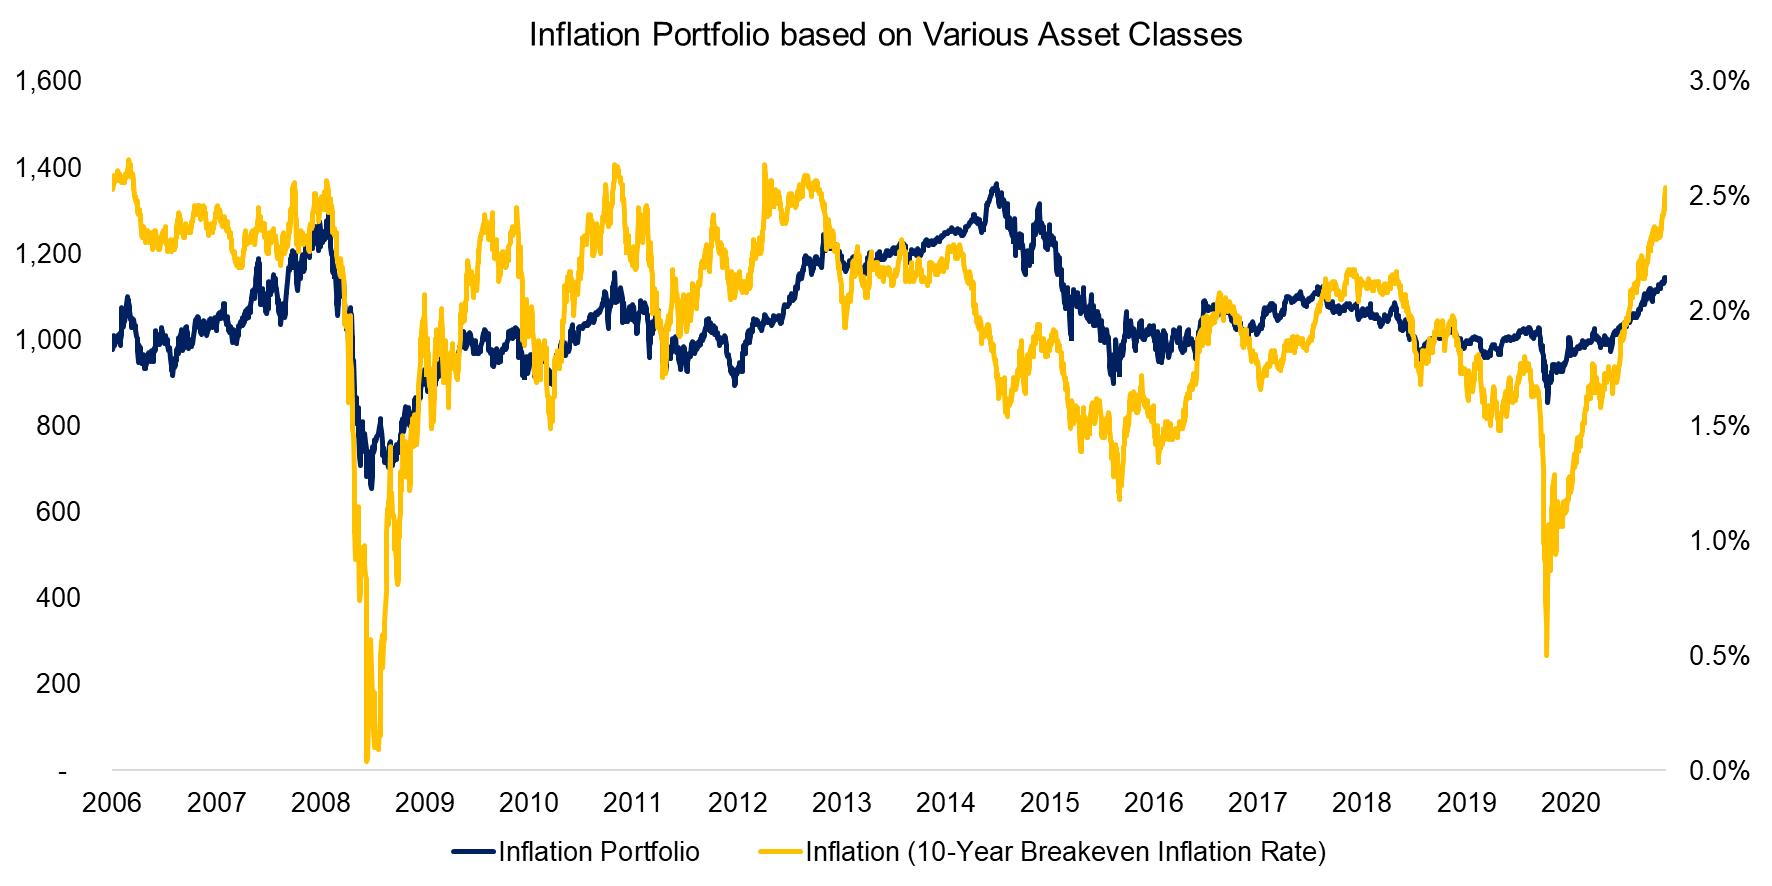 Inflation Portfolio based on Various Asset Classes